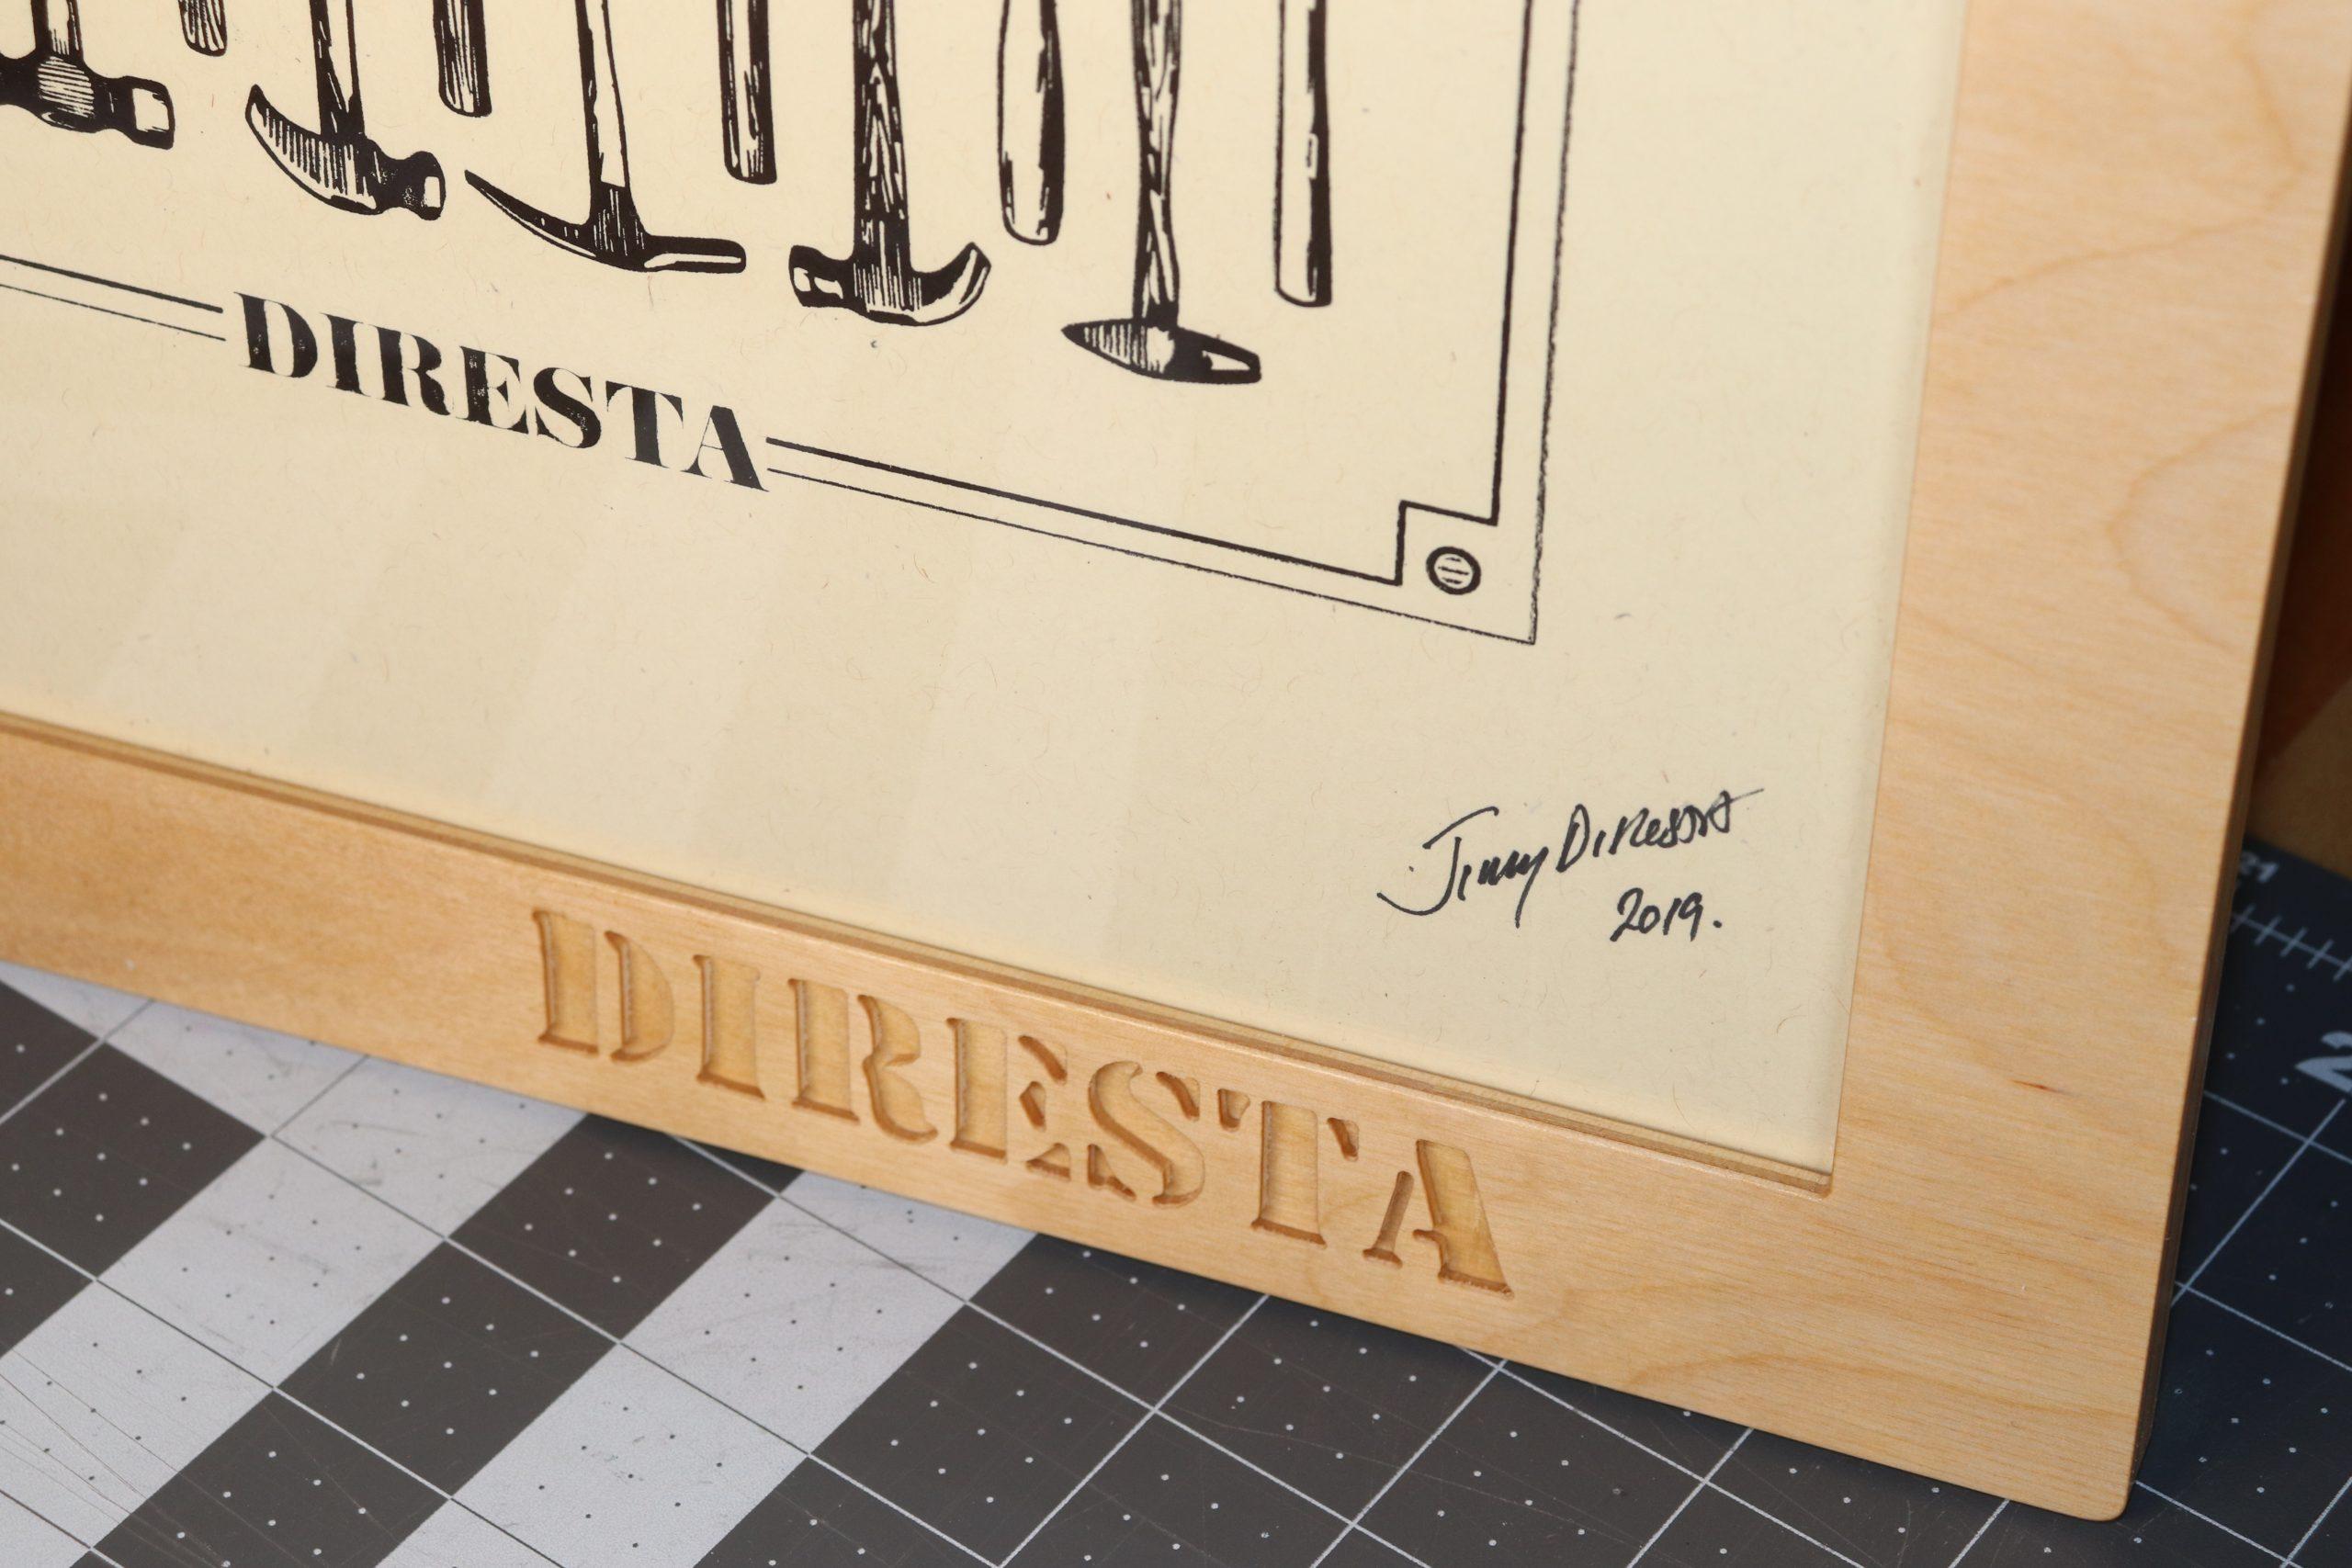 Diresta Print Frame Detail - Neo7CNC